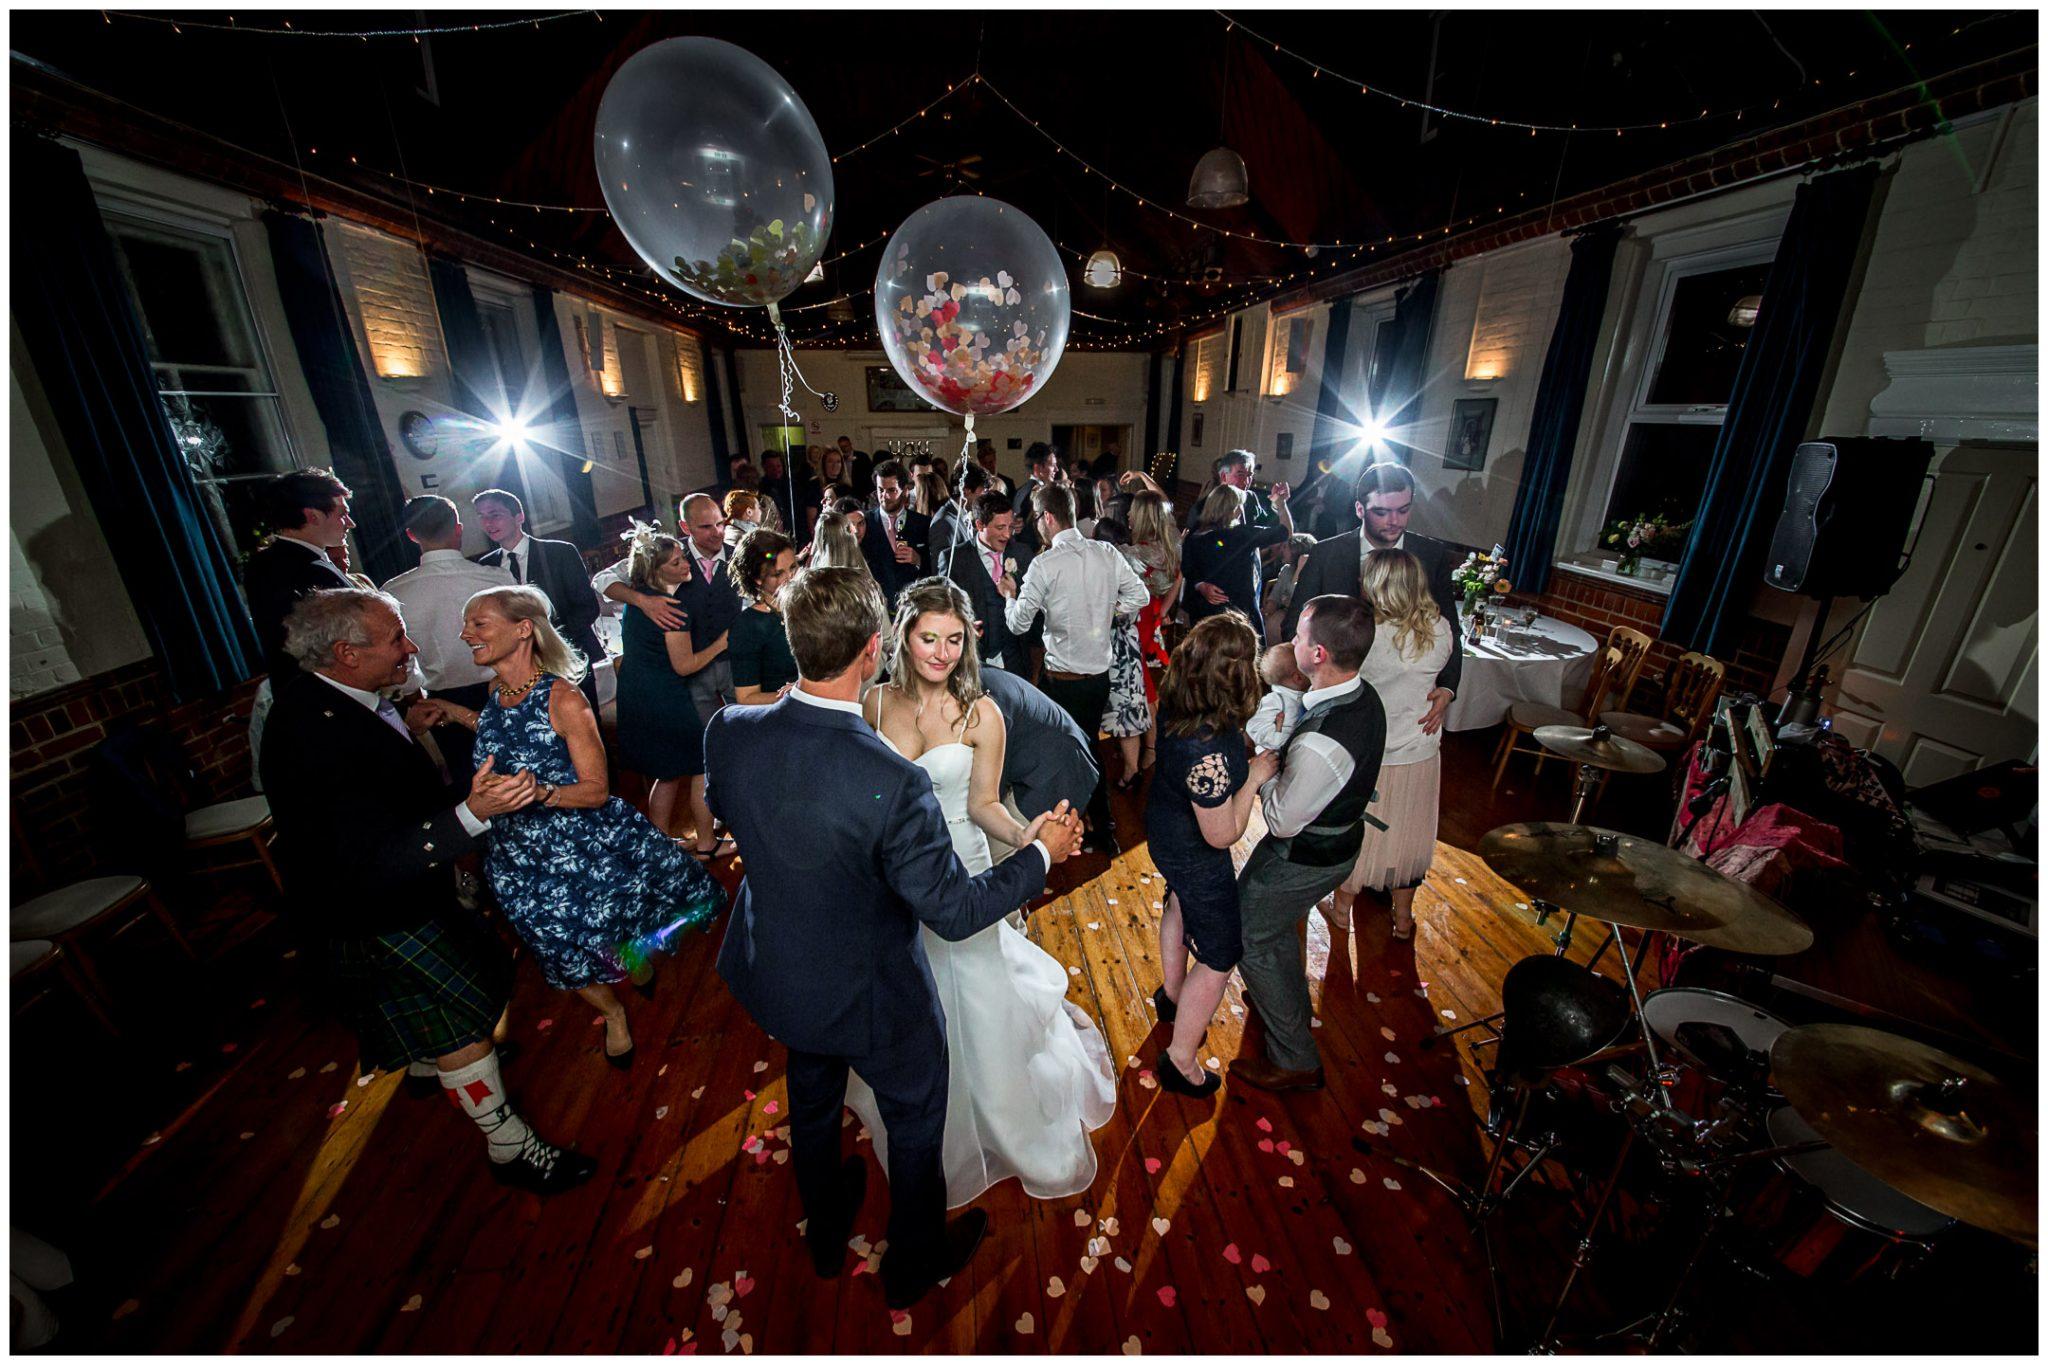 Bride, groom and guests dancing at village hall wedding reception